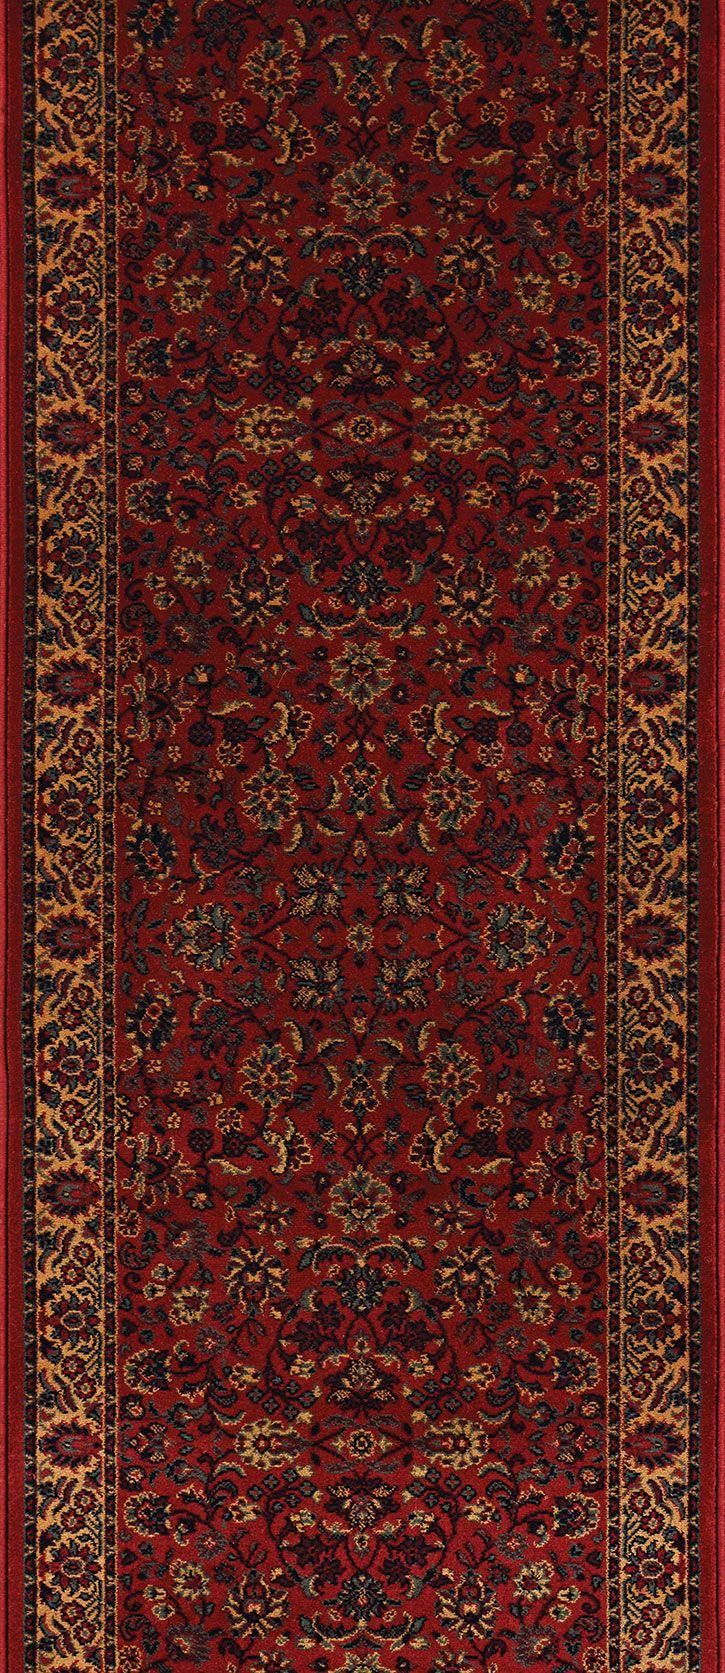 Best Couristan Everest 3791 4872A Isfahan Crimson 2 2 26 640 x 480